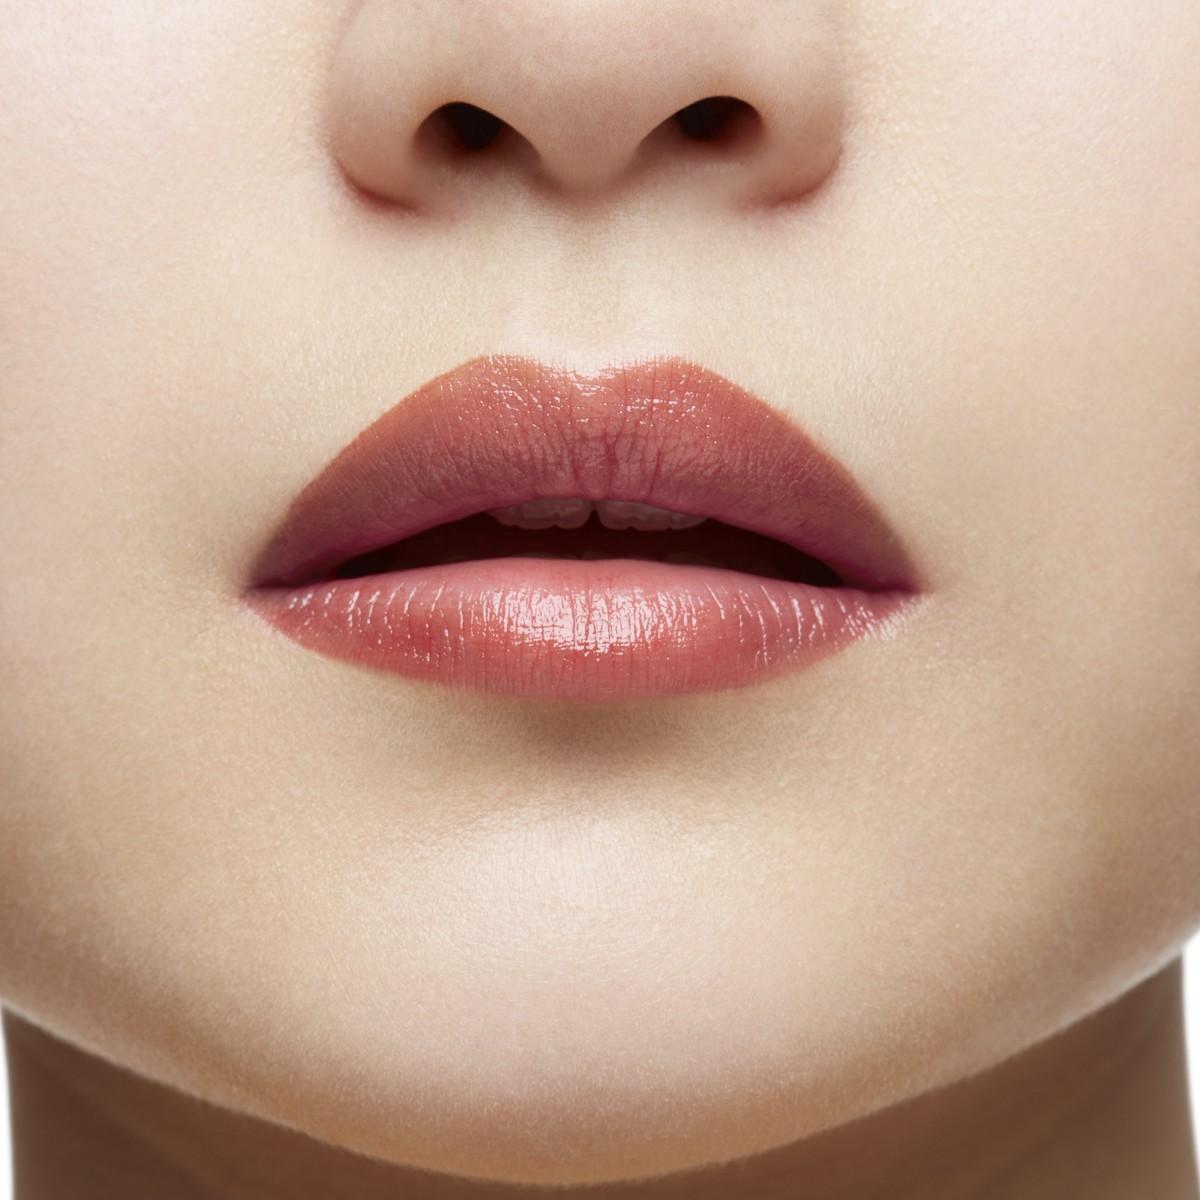 Woman Beauty - Rose Du Désert Sheer Voile - Christian Louboutin